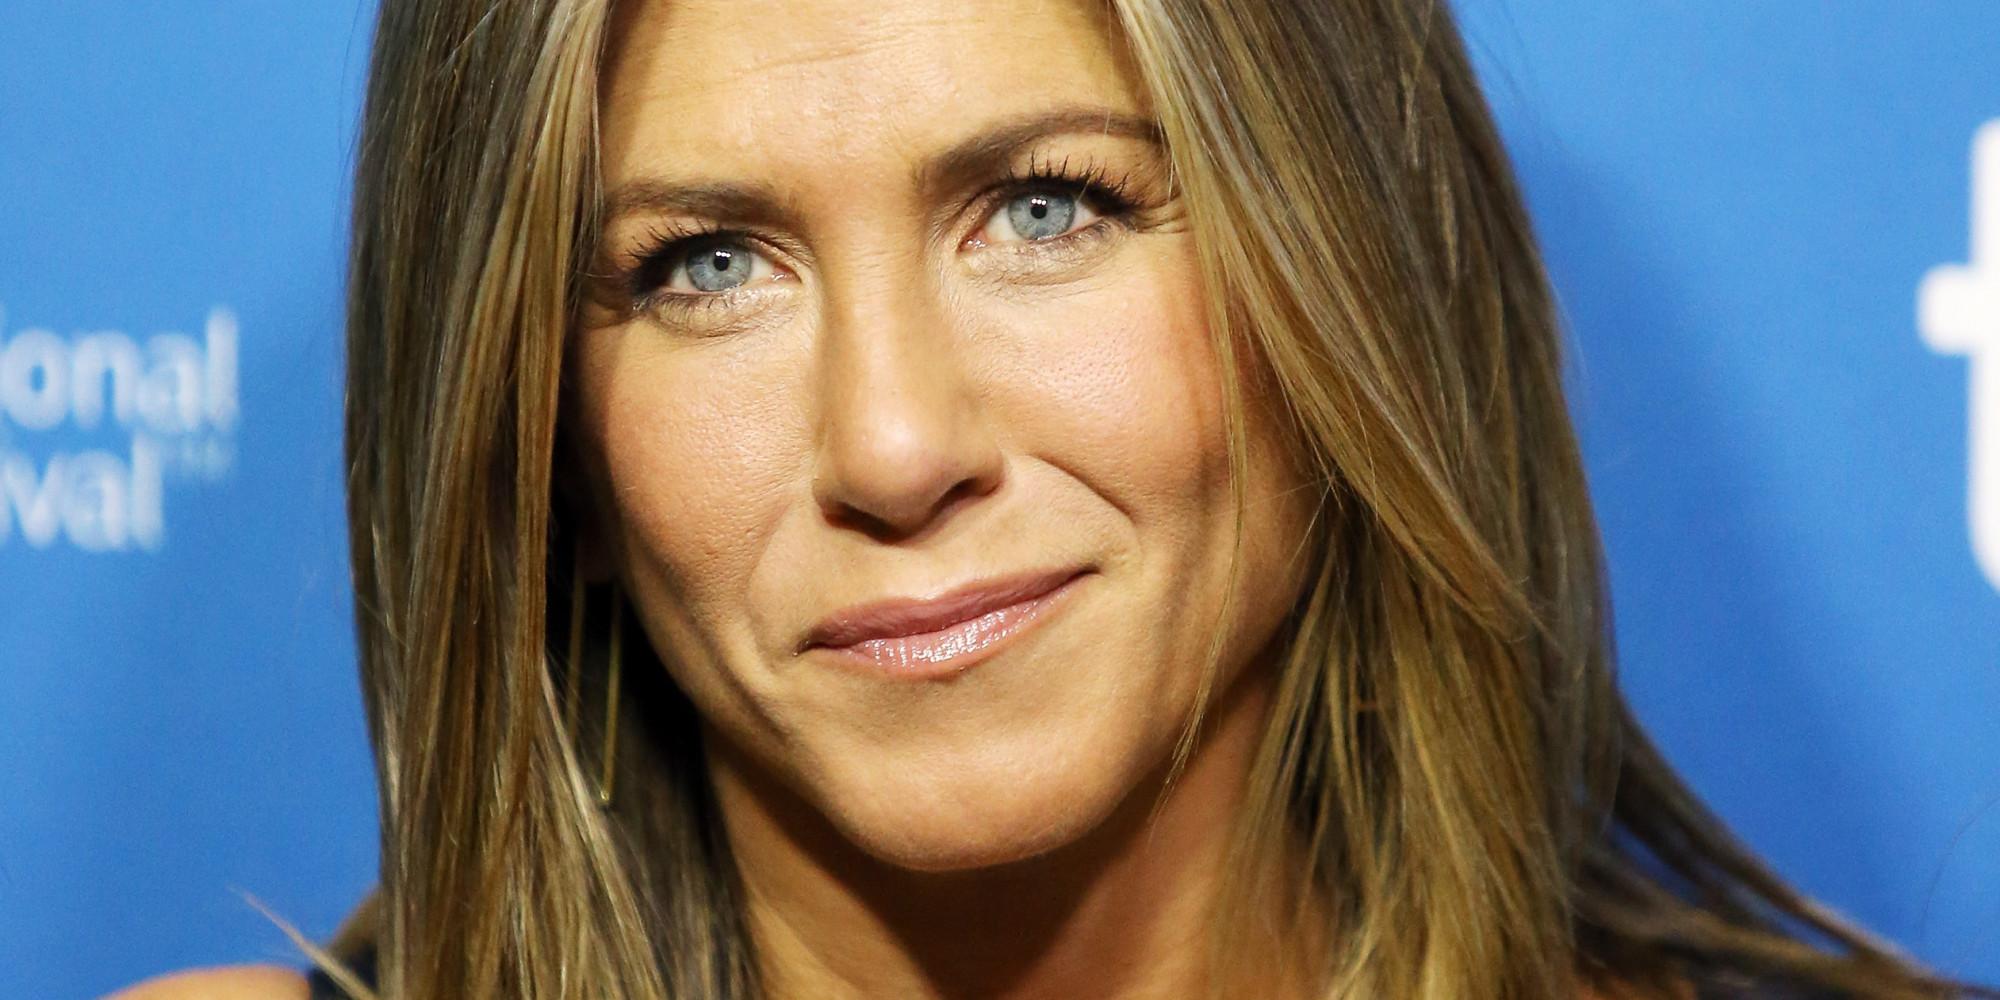 Jennifer Aniston Backgrounds on Wallpapers Vista